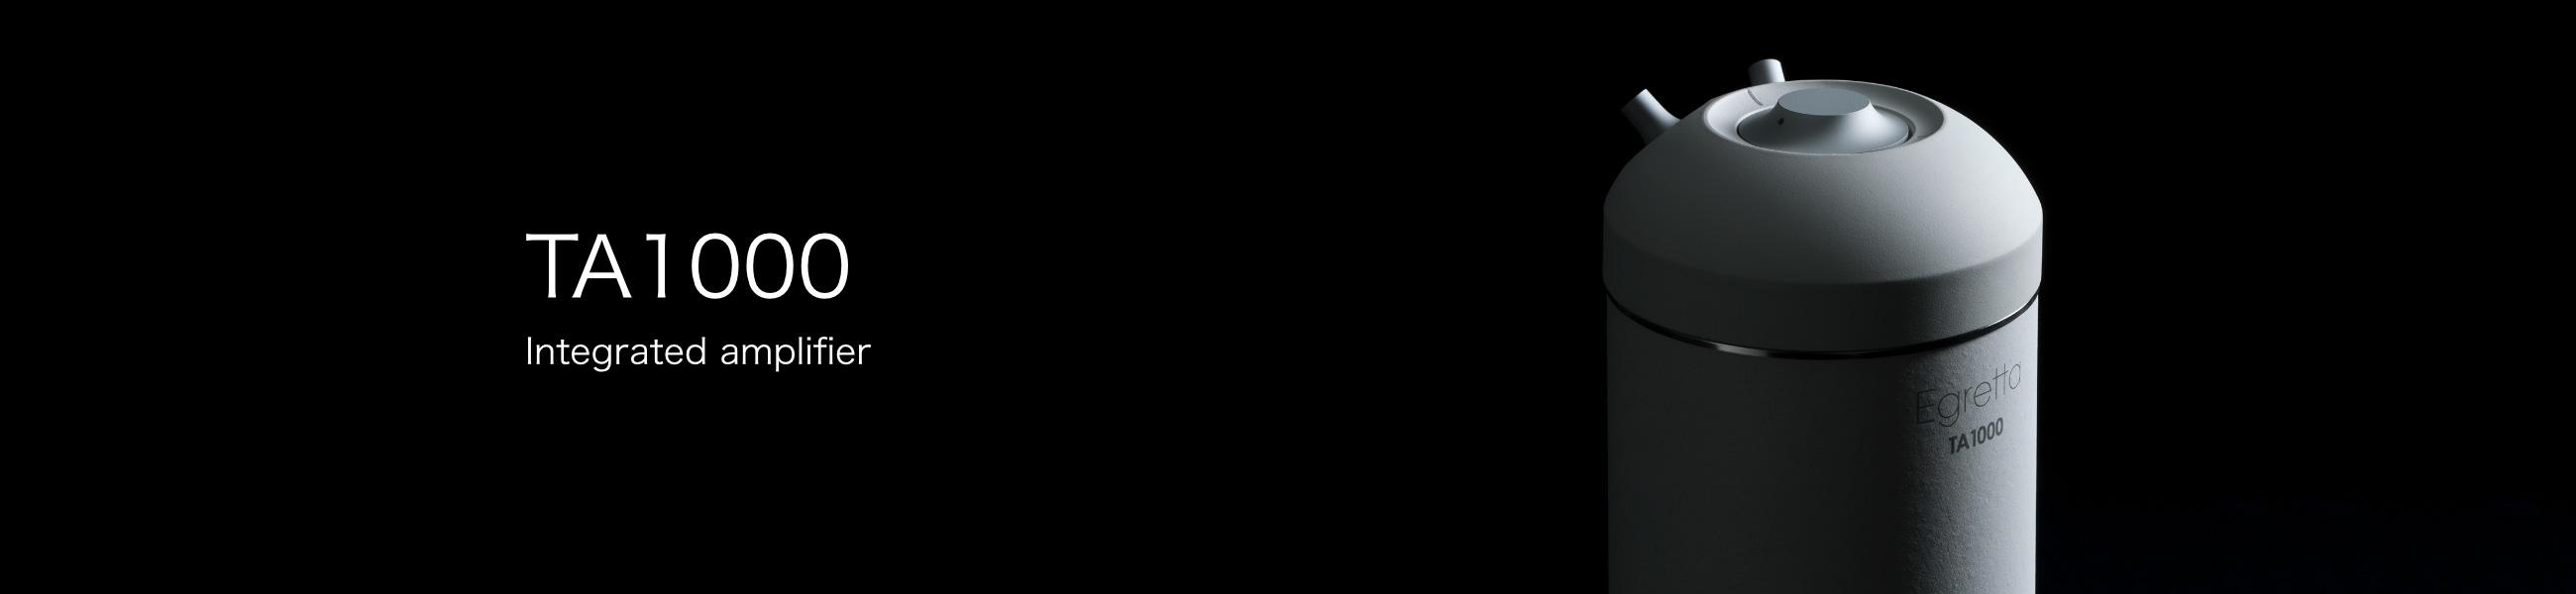 TA1000